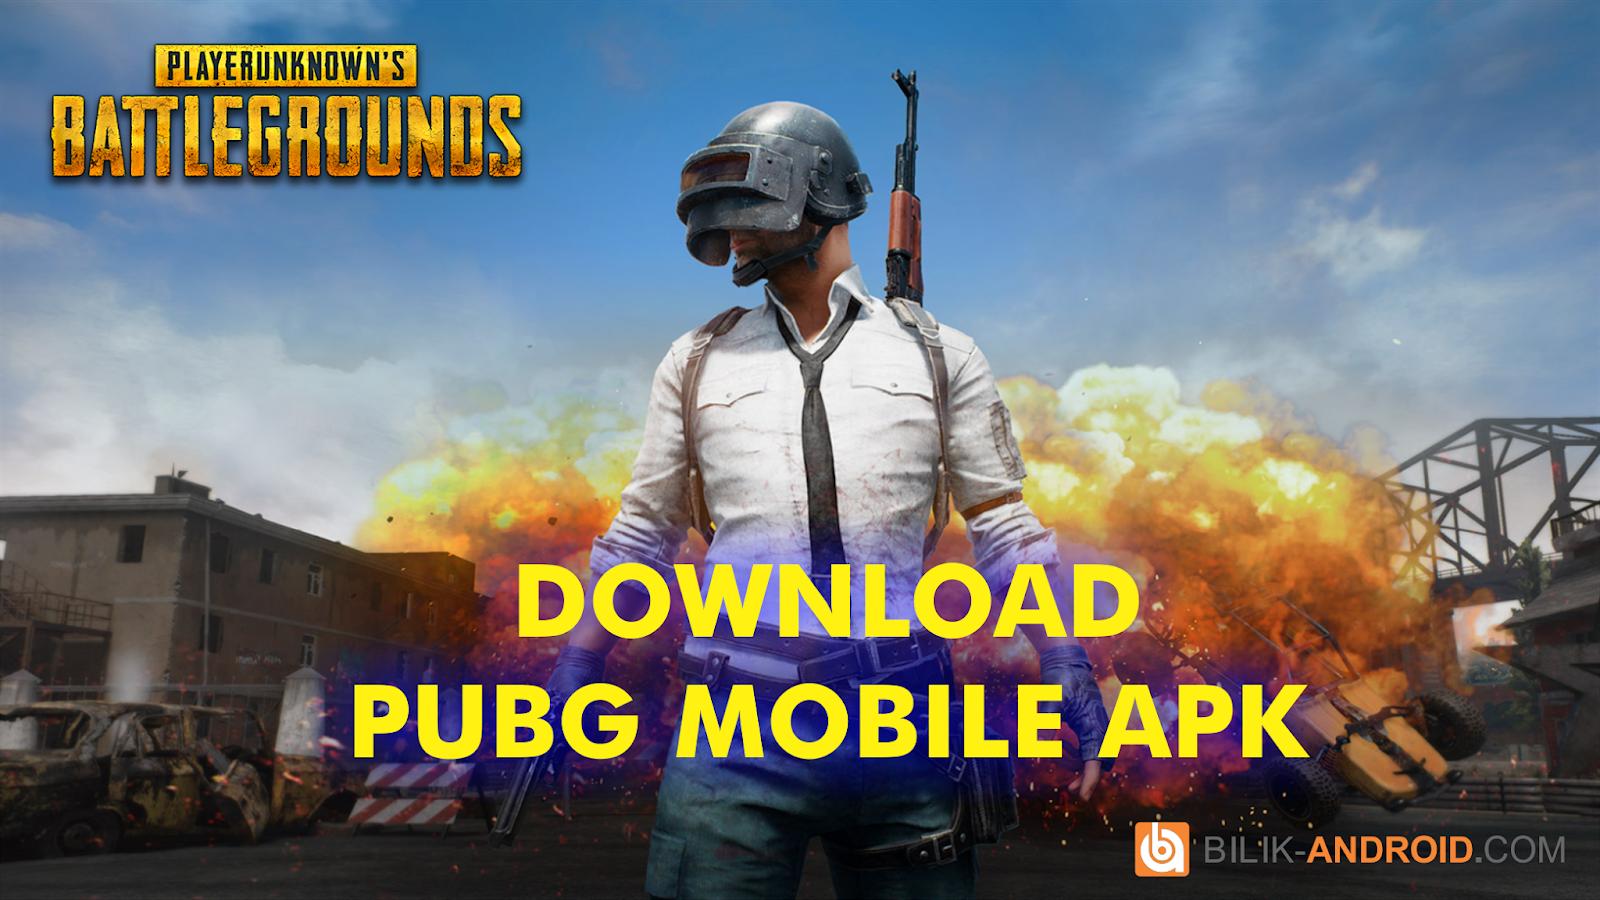 Download Pubg Mobile 0 7 0 Apk Bilik Android